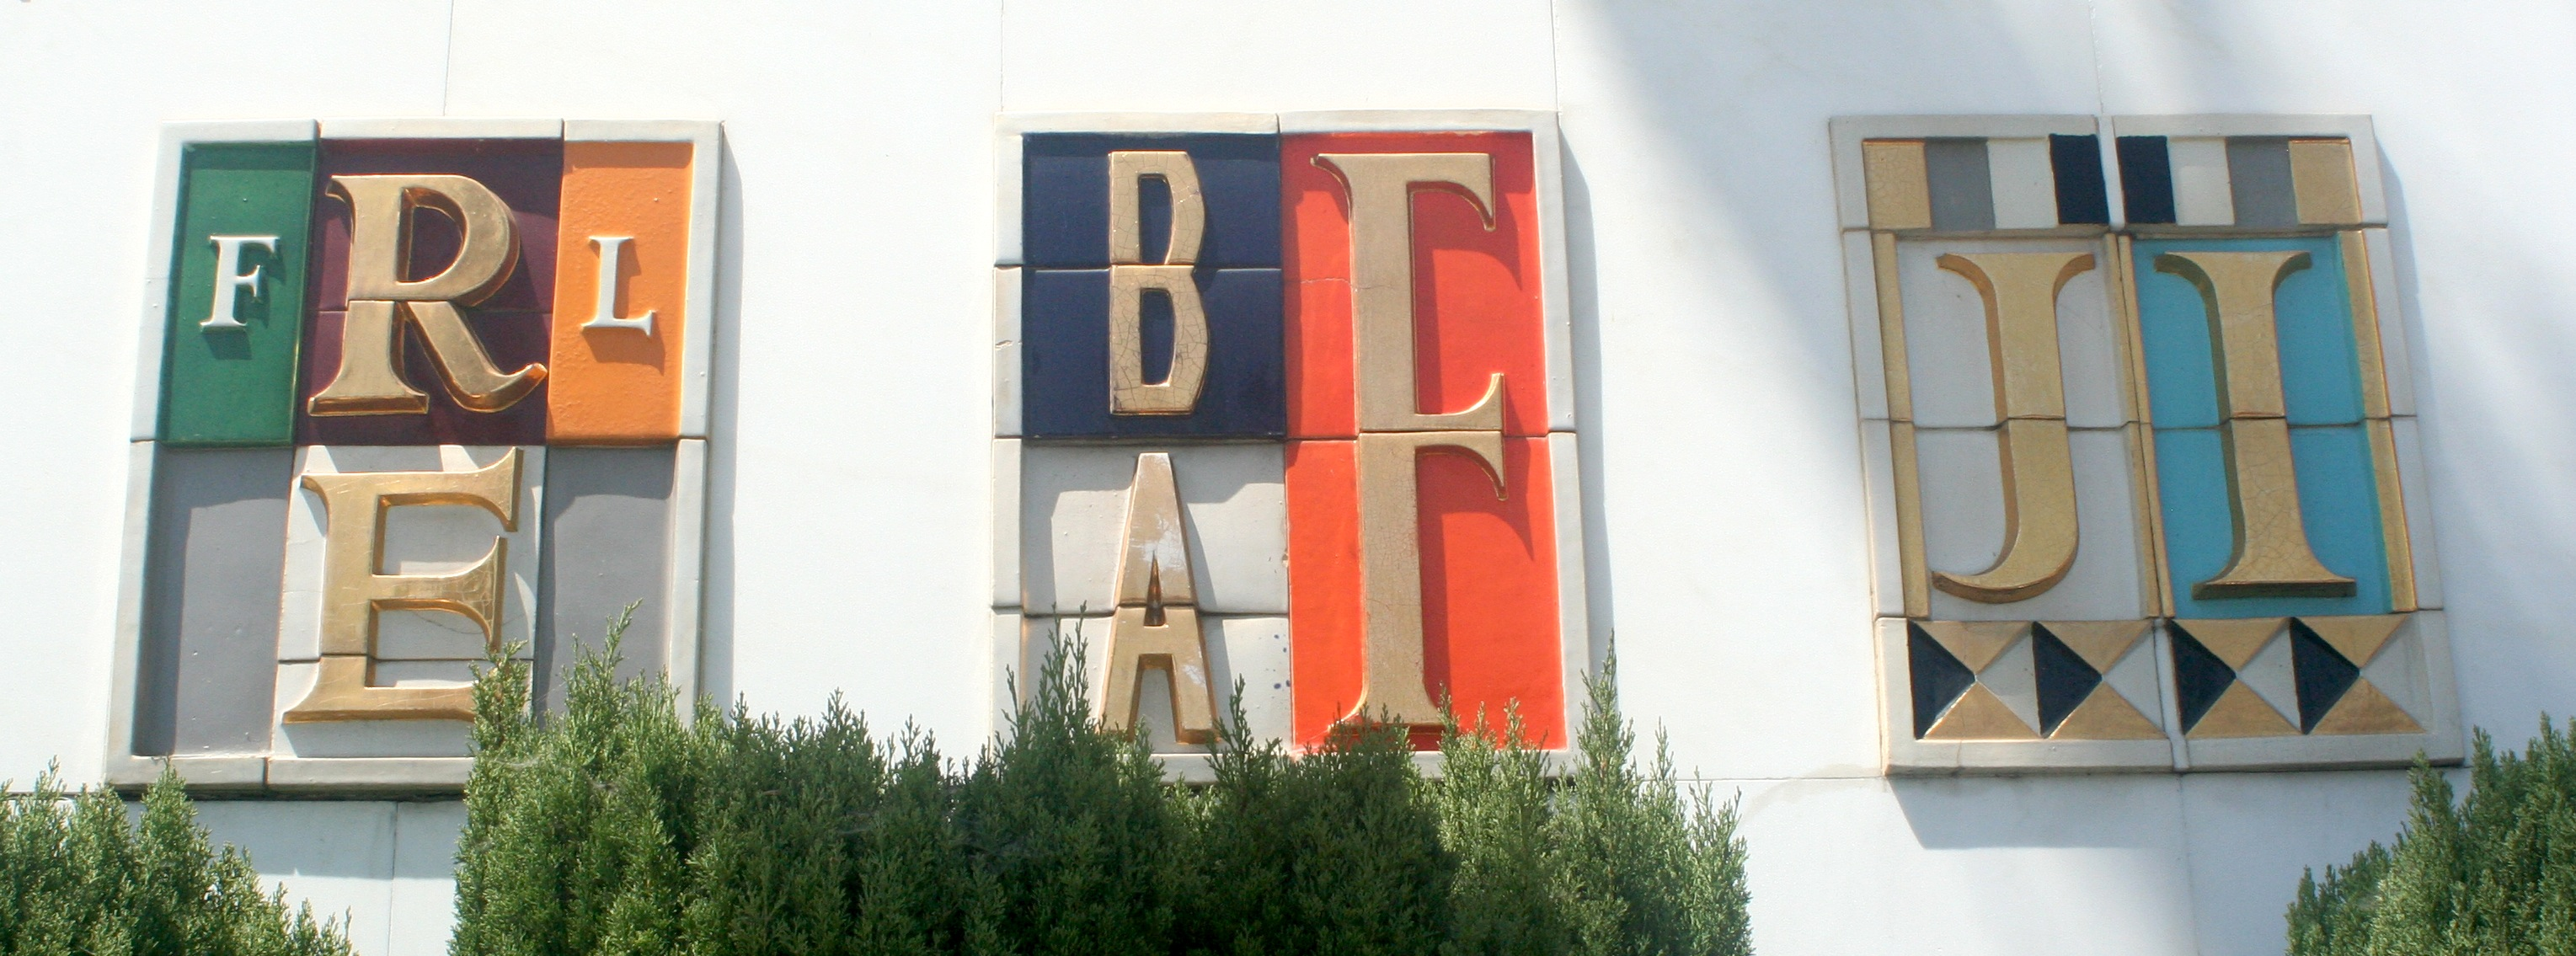 "Sheets Studio, logos for Fred L. Roberts Enterprises and Bay Area Finance and ""JI,"" Santa Monica, built 1957, photo 2012."